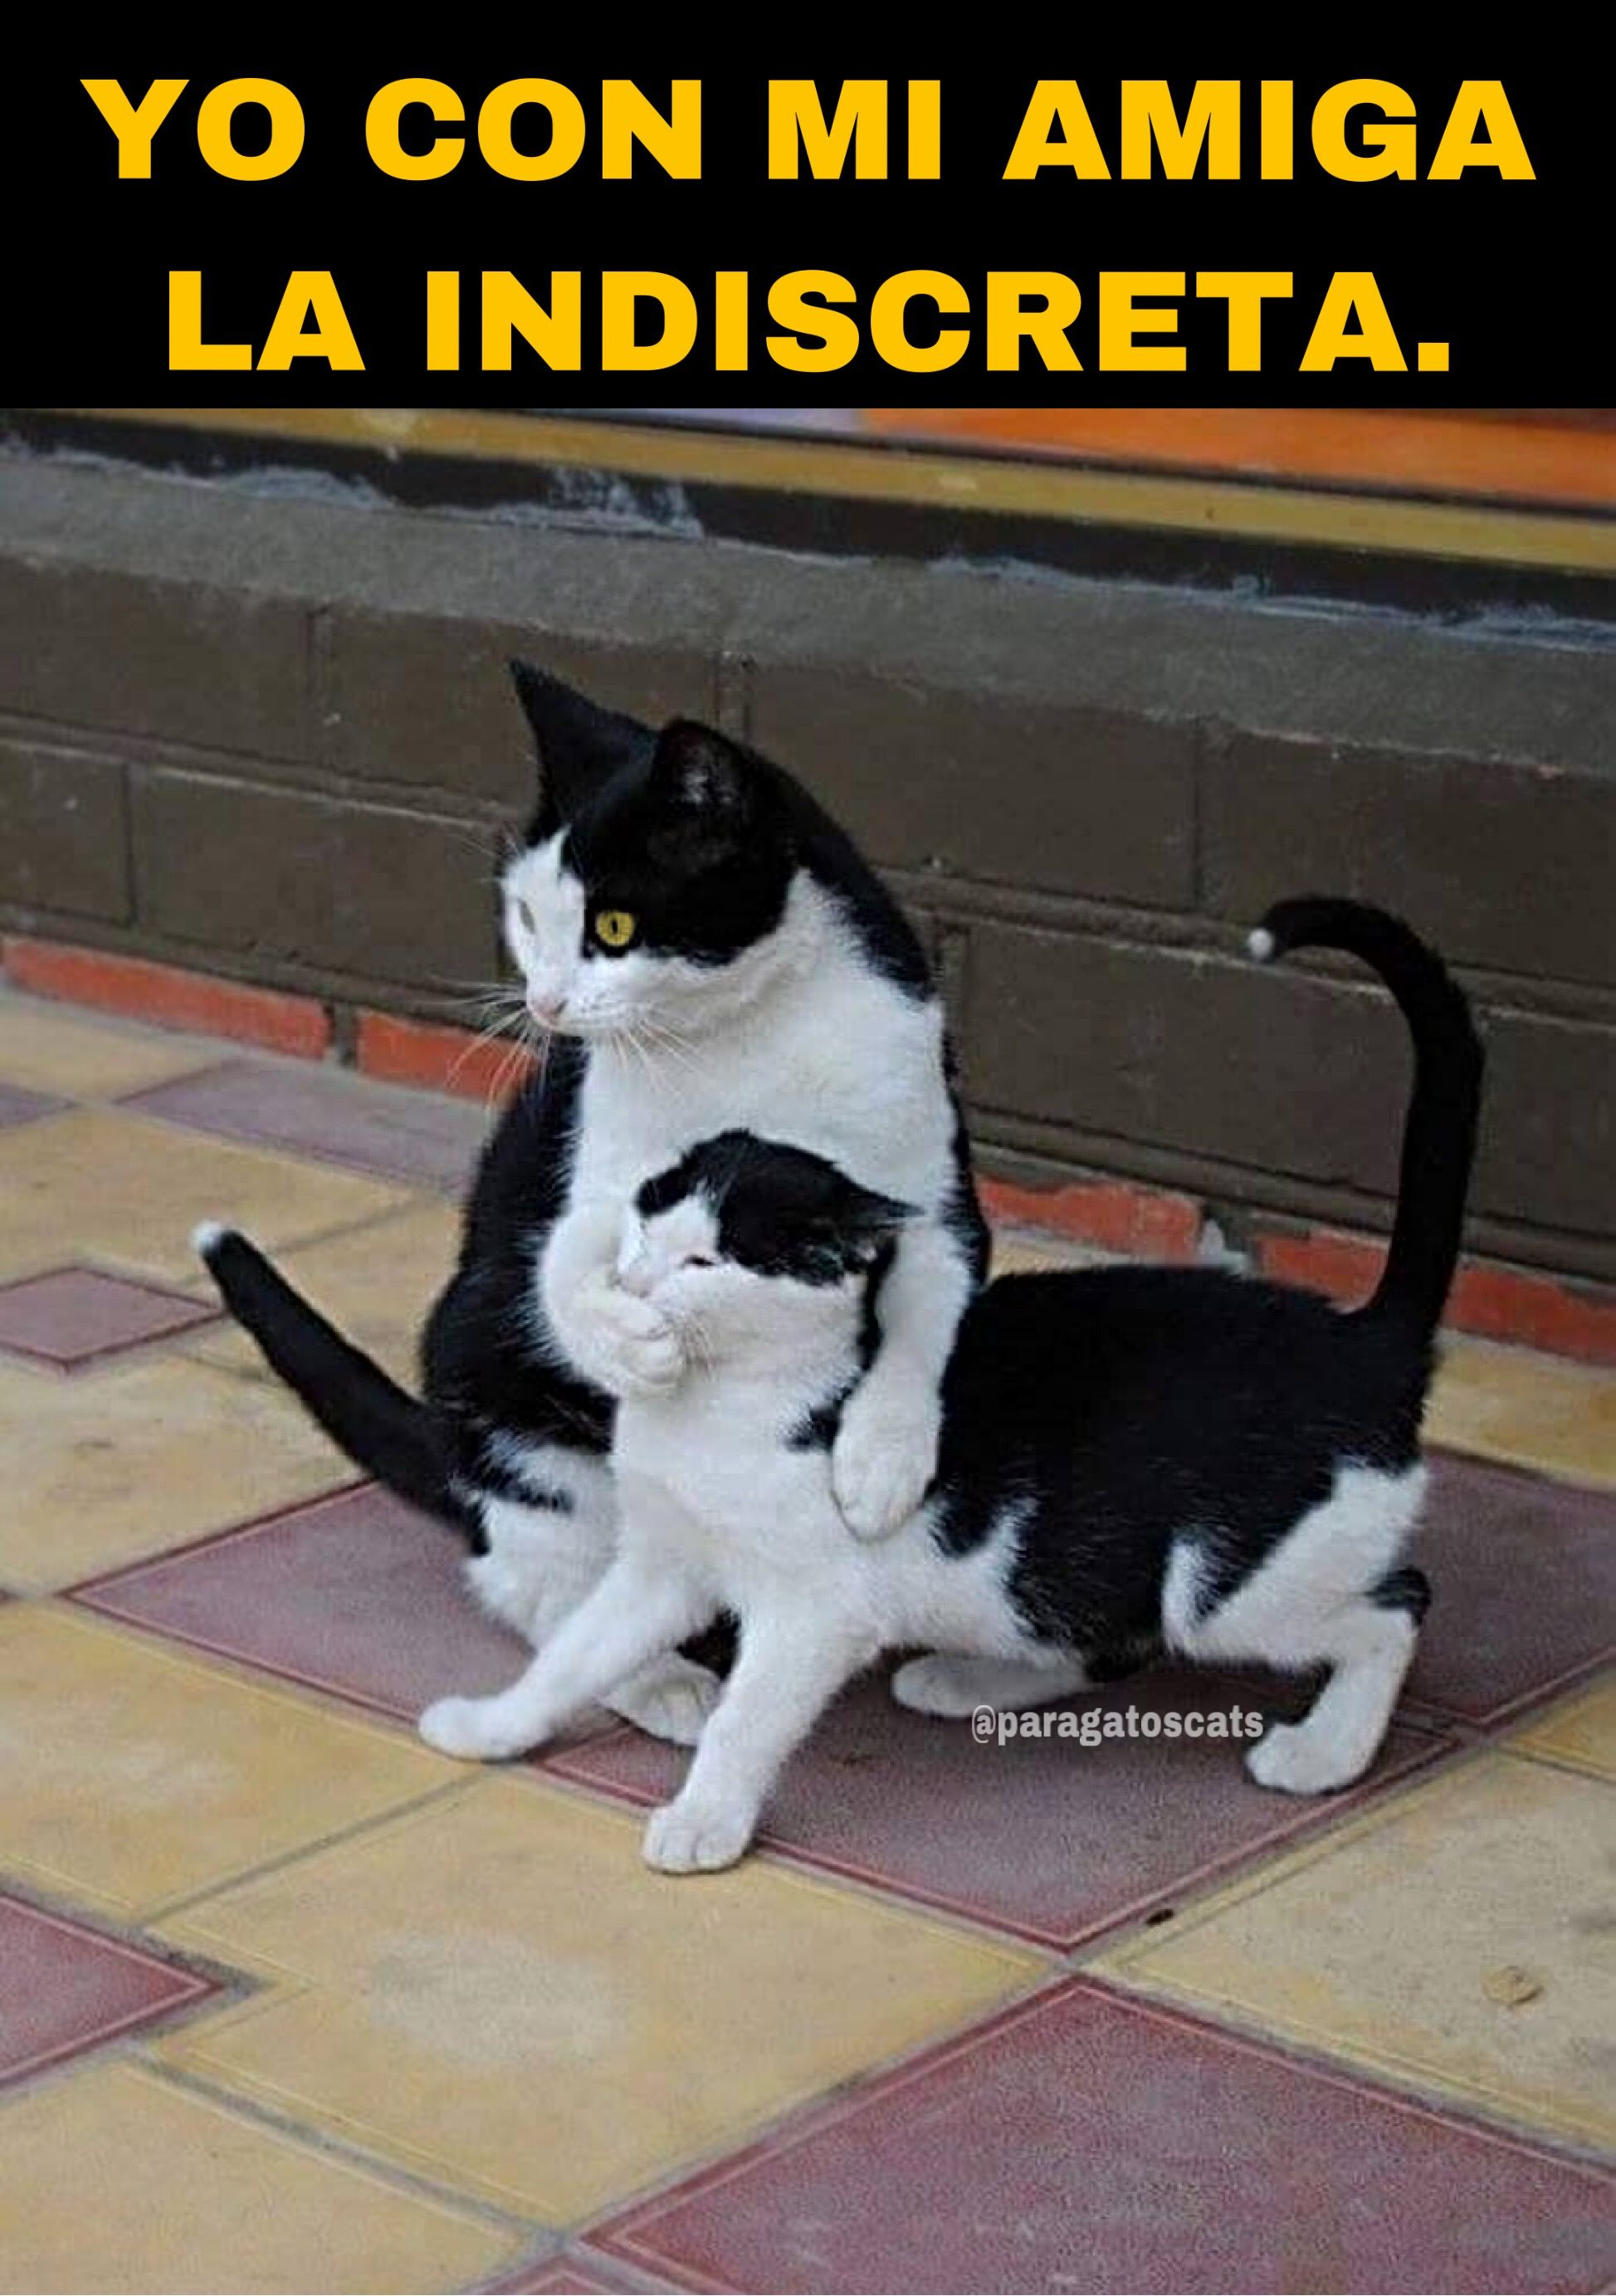 Memes De Gatos Memes Divertidos Los Mejores Memes De